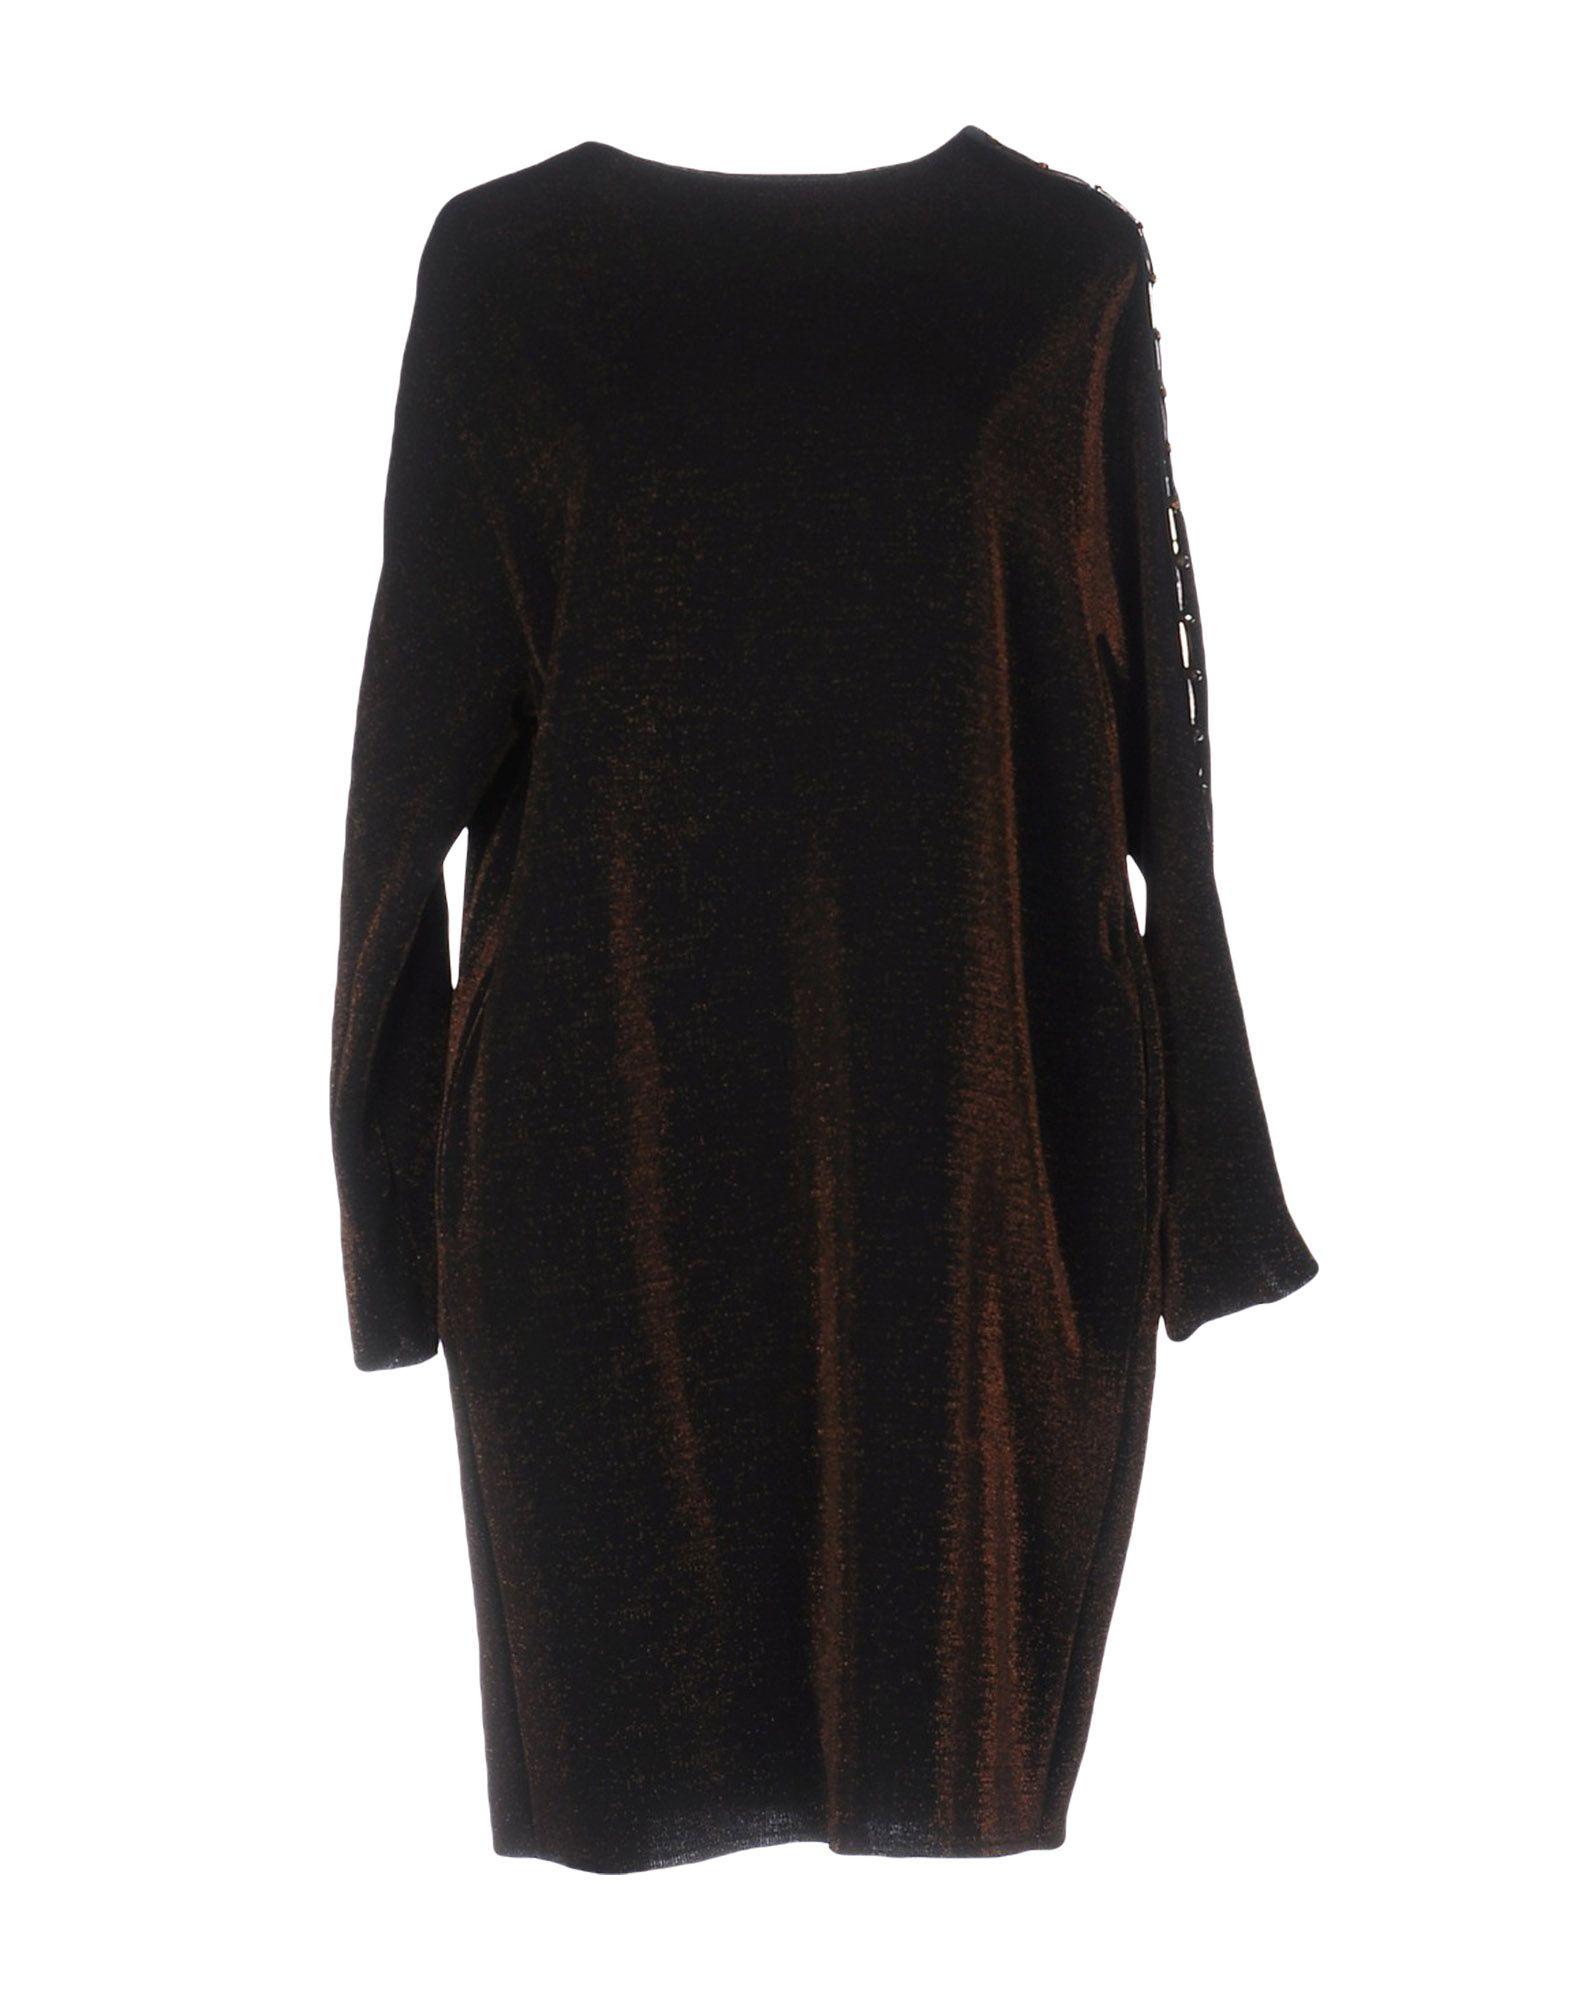 OBLÒ Damen Kurzes Kleid Farbe Dunkelbraun Größe 5